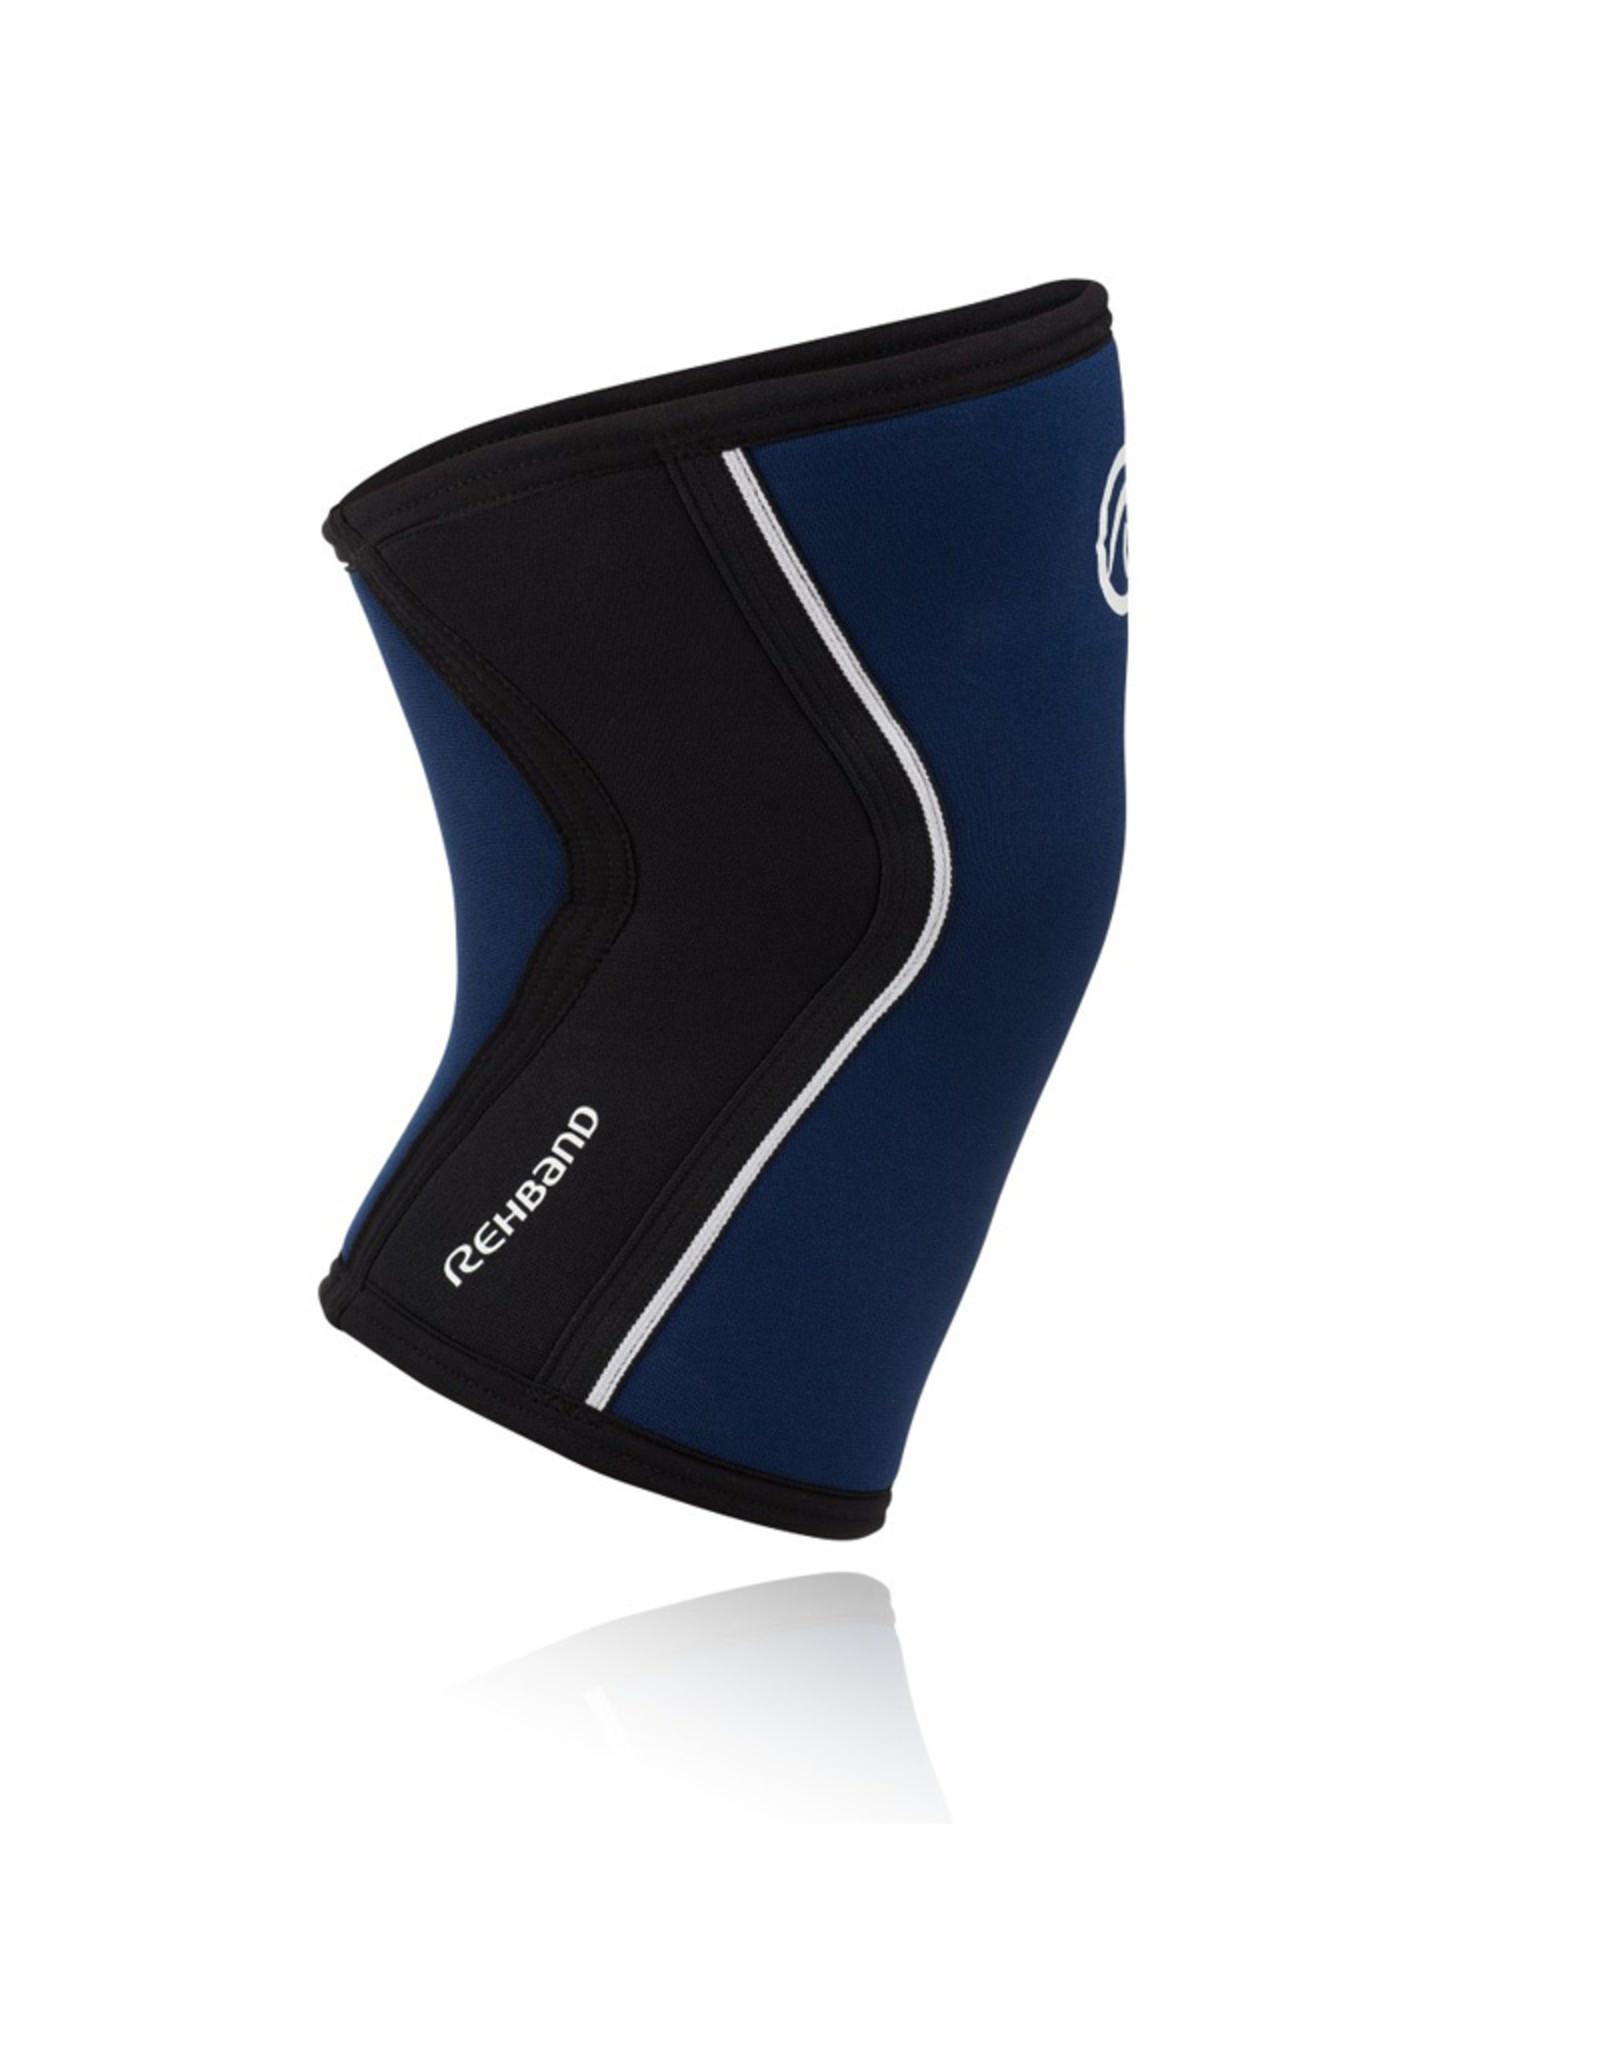 Rehband Rx Knee Sleeve 5Mm Kniebrace - Navy